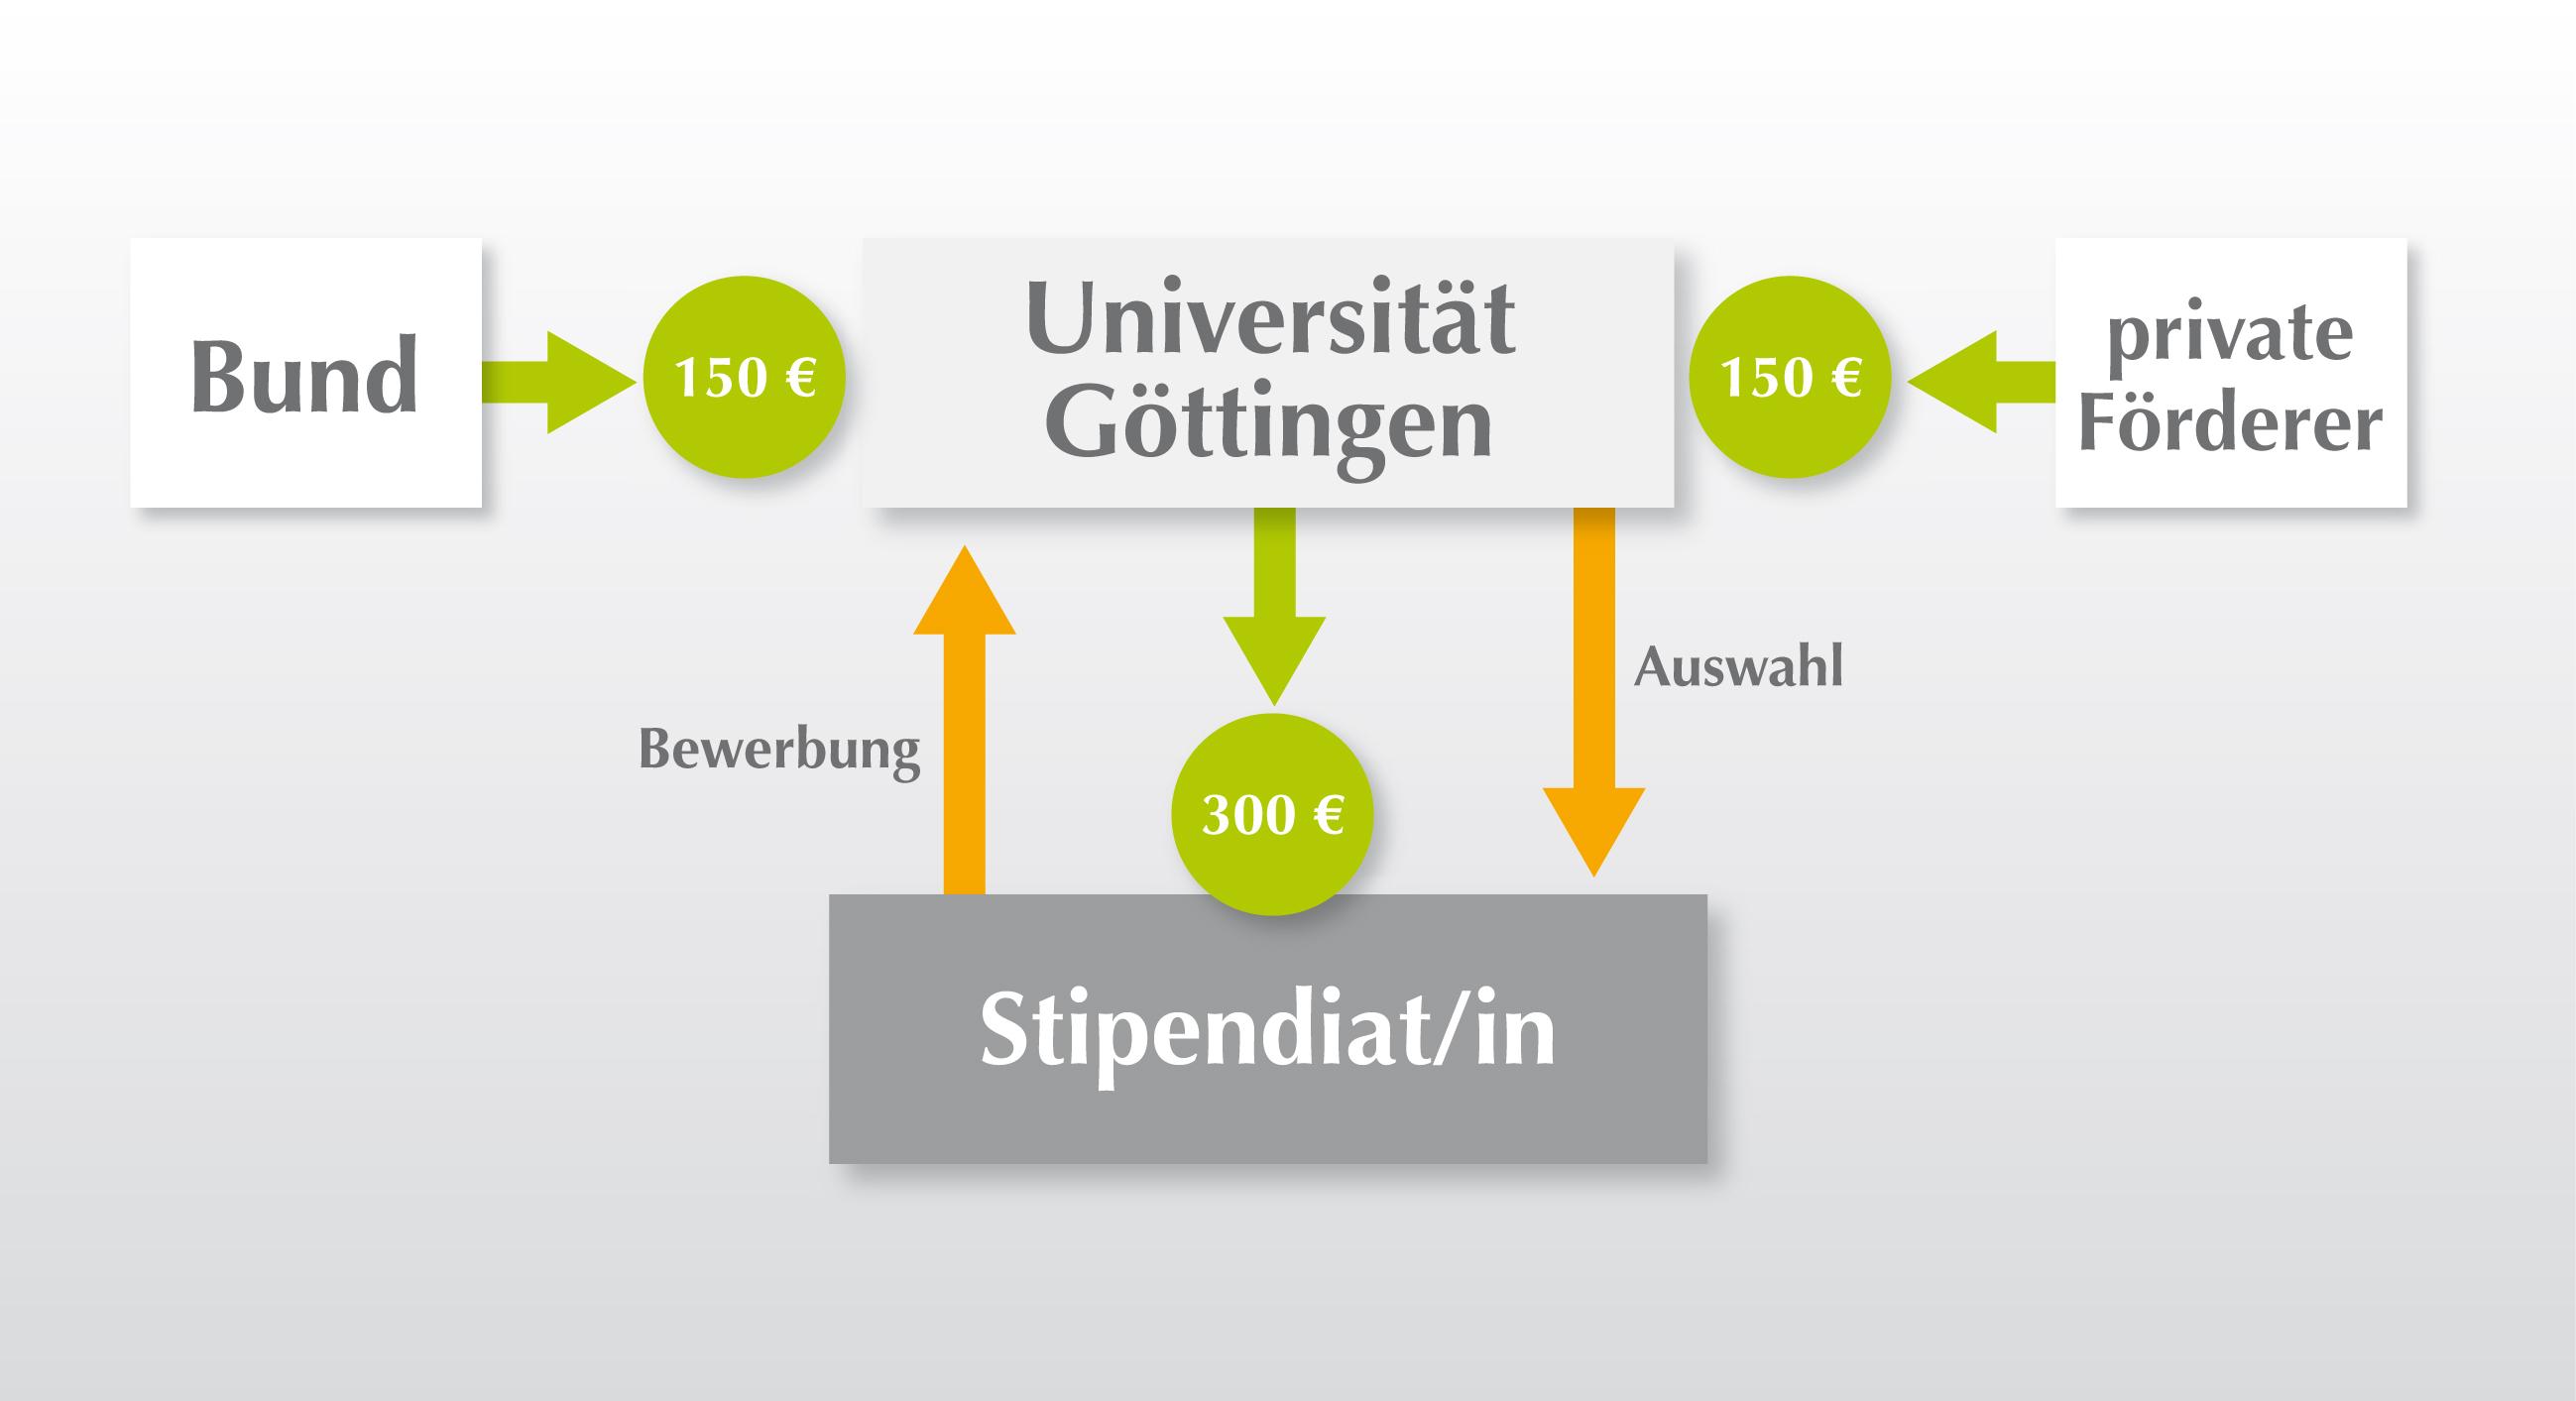 deustip - Bewerbung Deutschlandstipendium